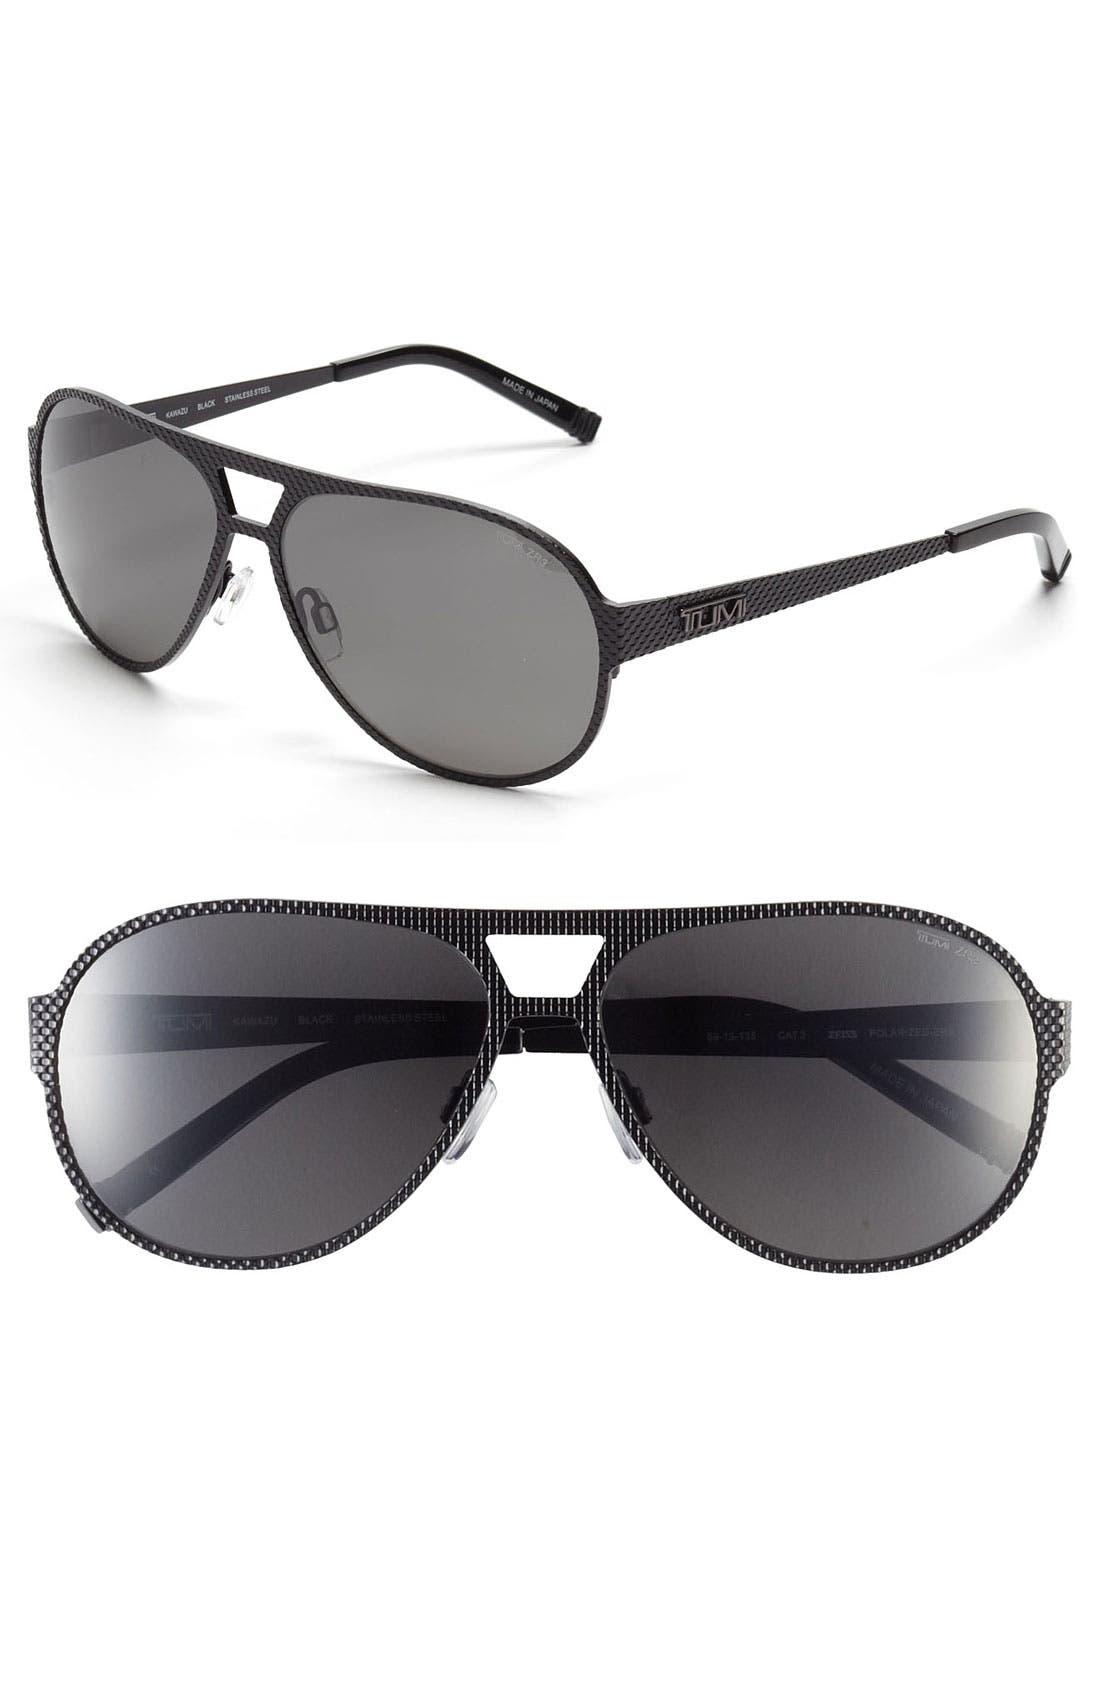 Main Image - Tumi 'Kawazu' 59mm Polarized Sunglasses